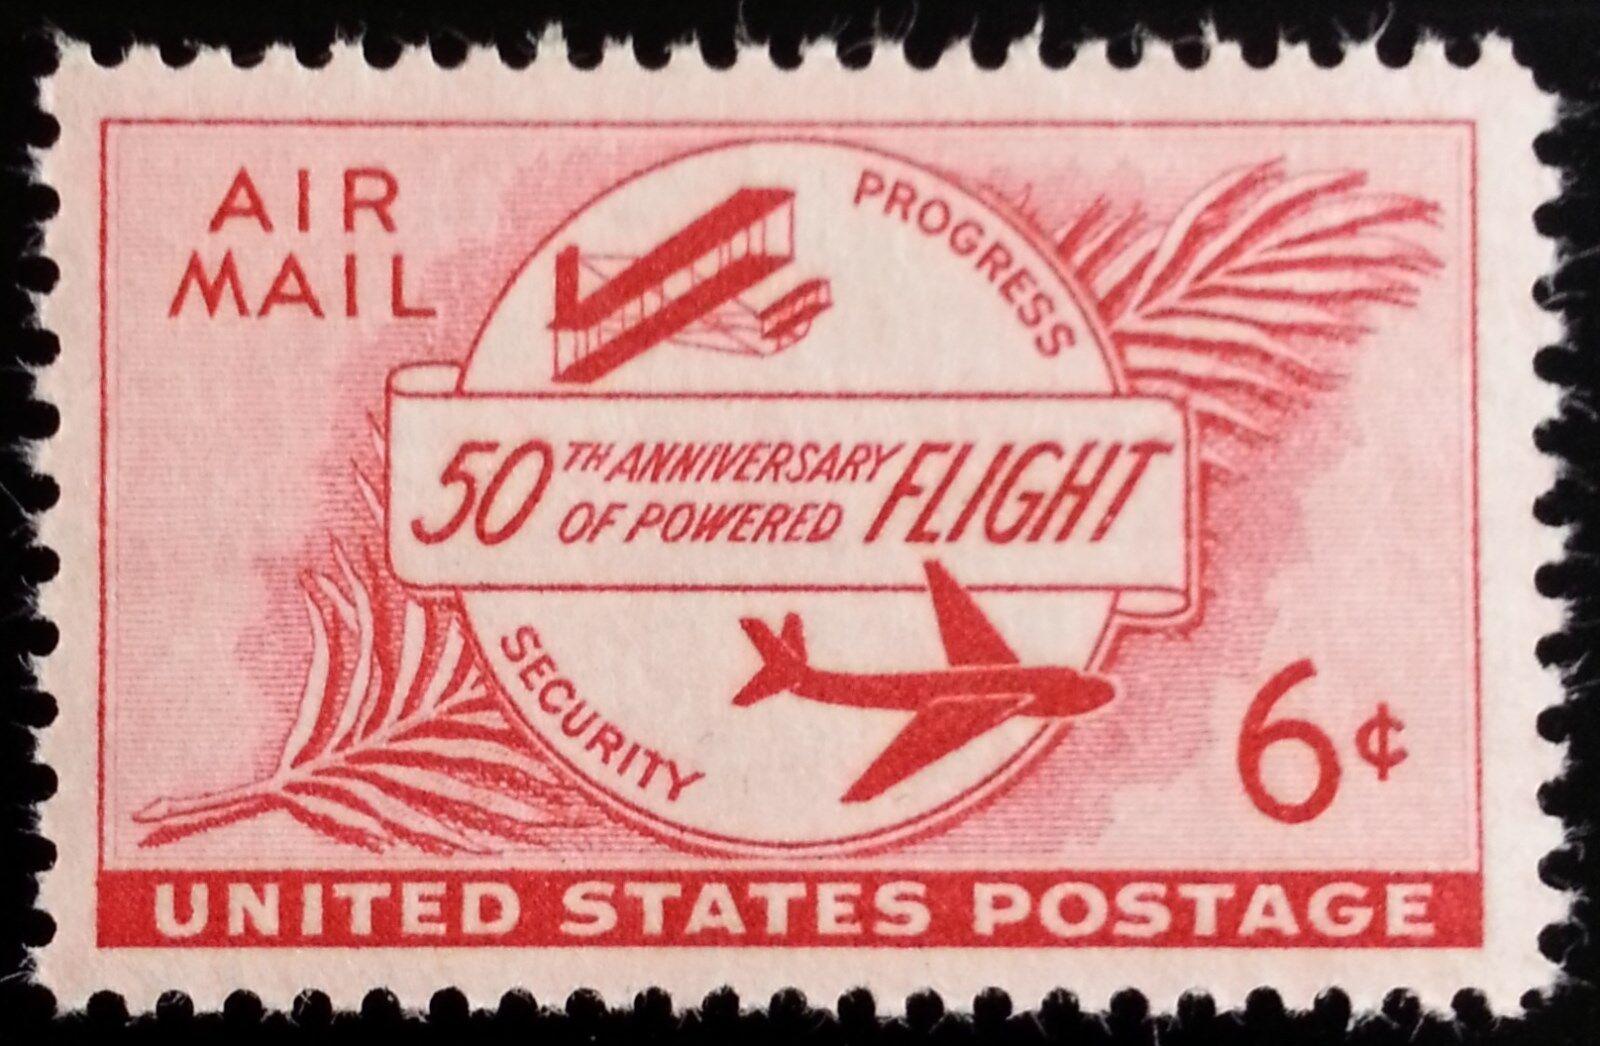 1953 6c Powered Flight, 50th Anniversary Scott C47 Mint